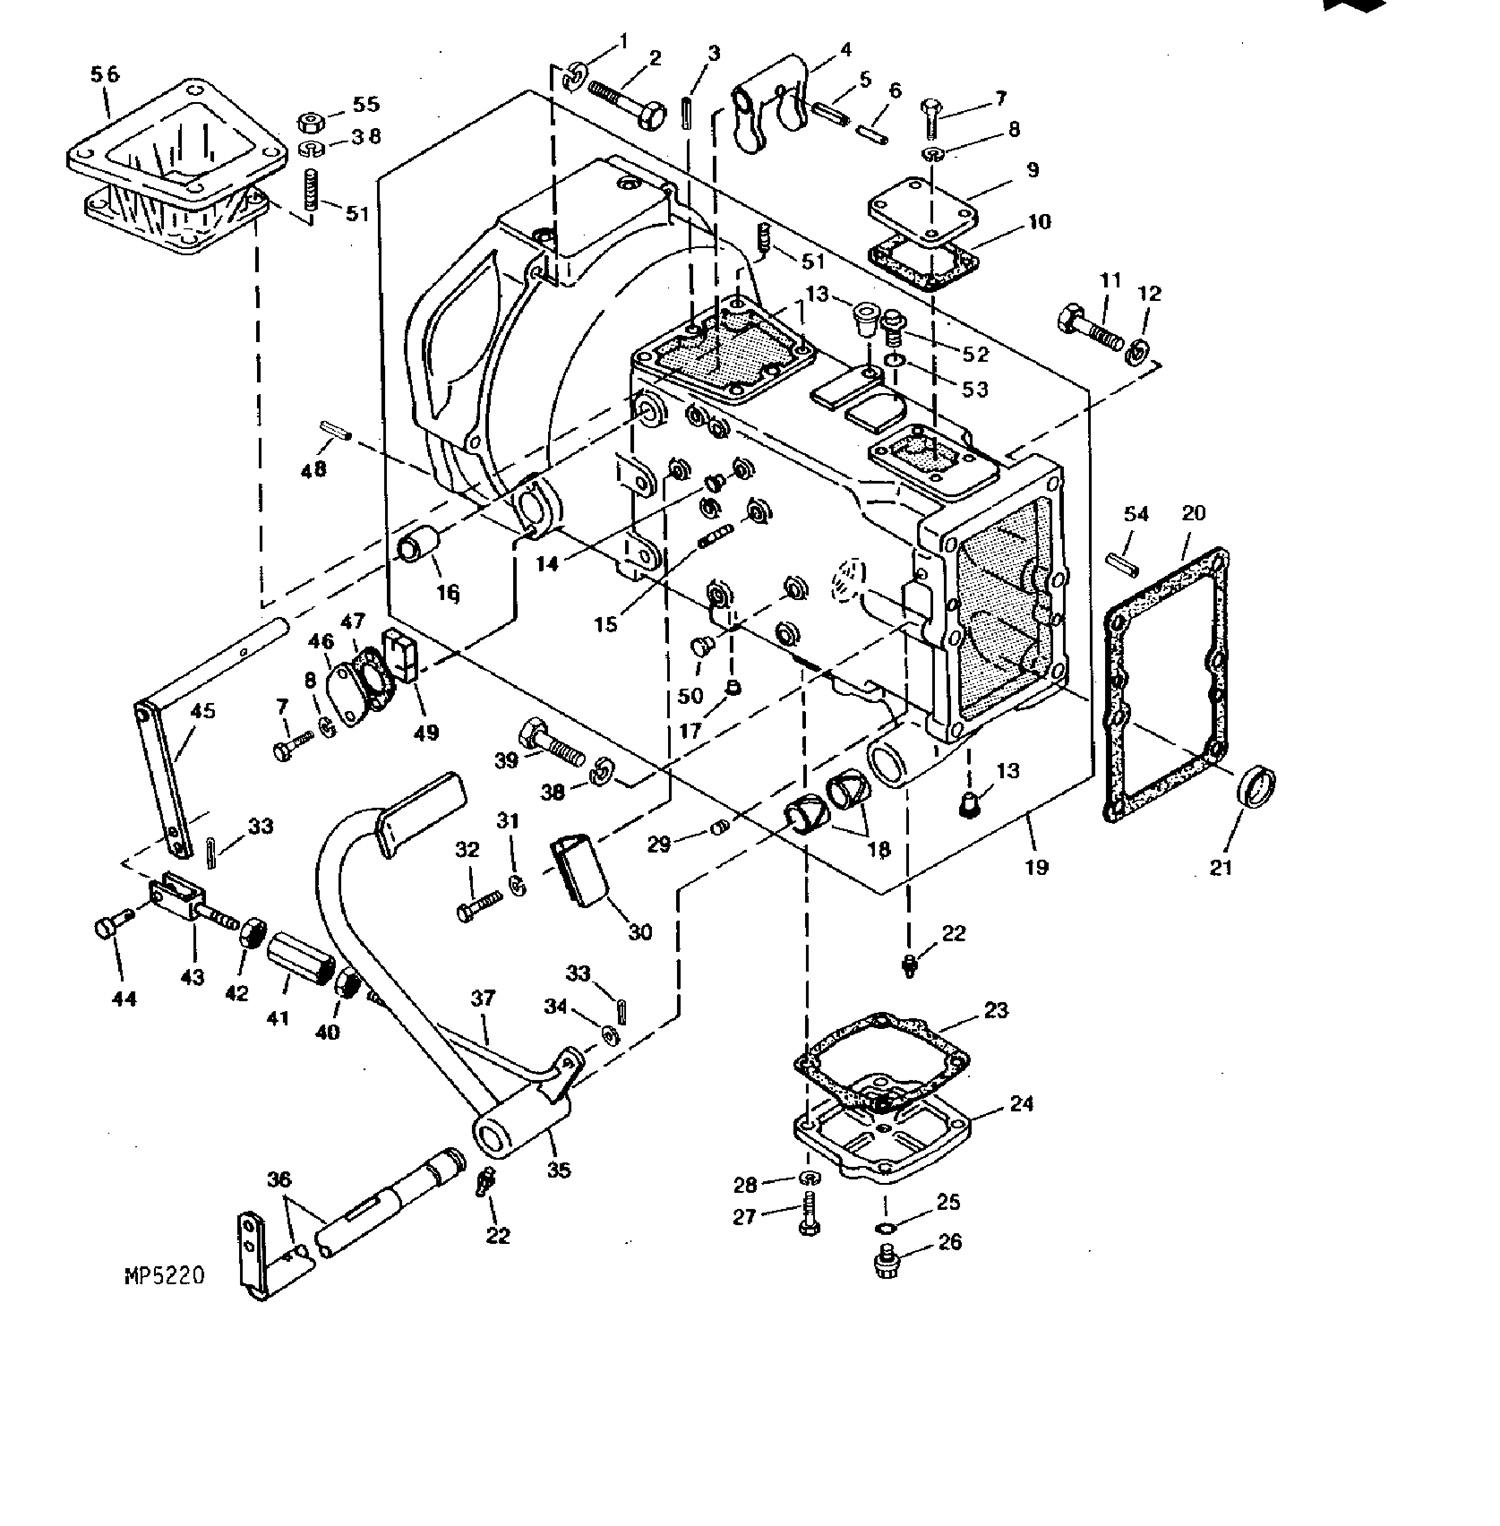 850 clutch housing_1 clutch parts for john deere compact tractors